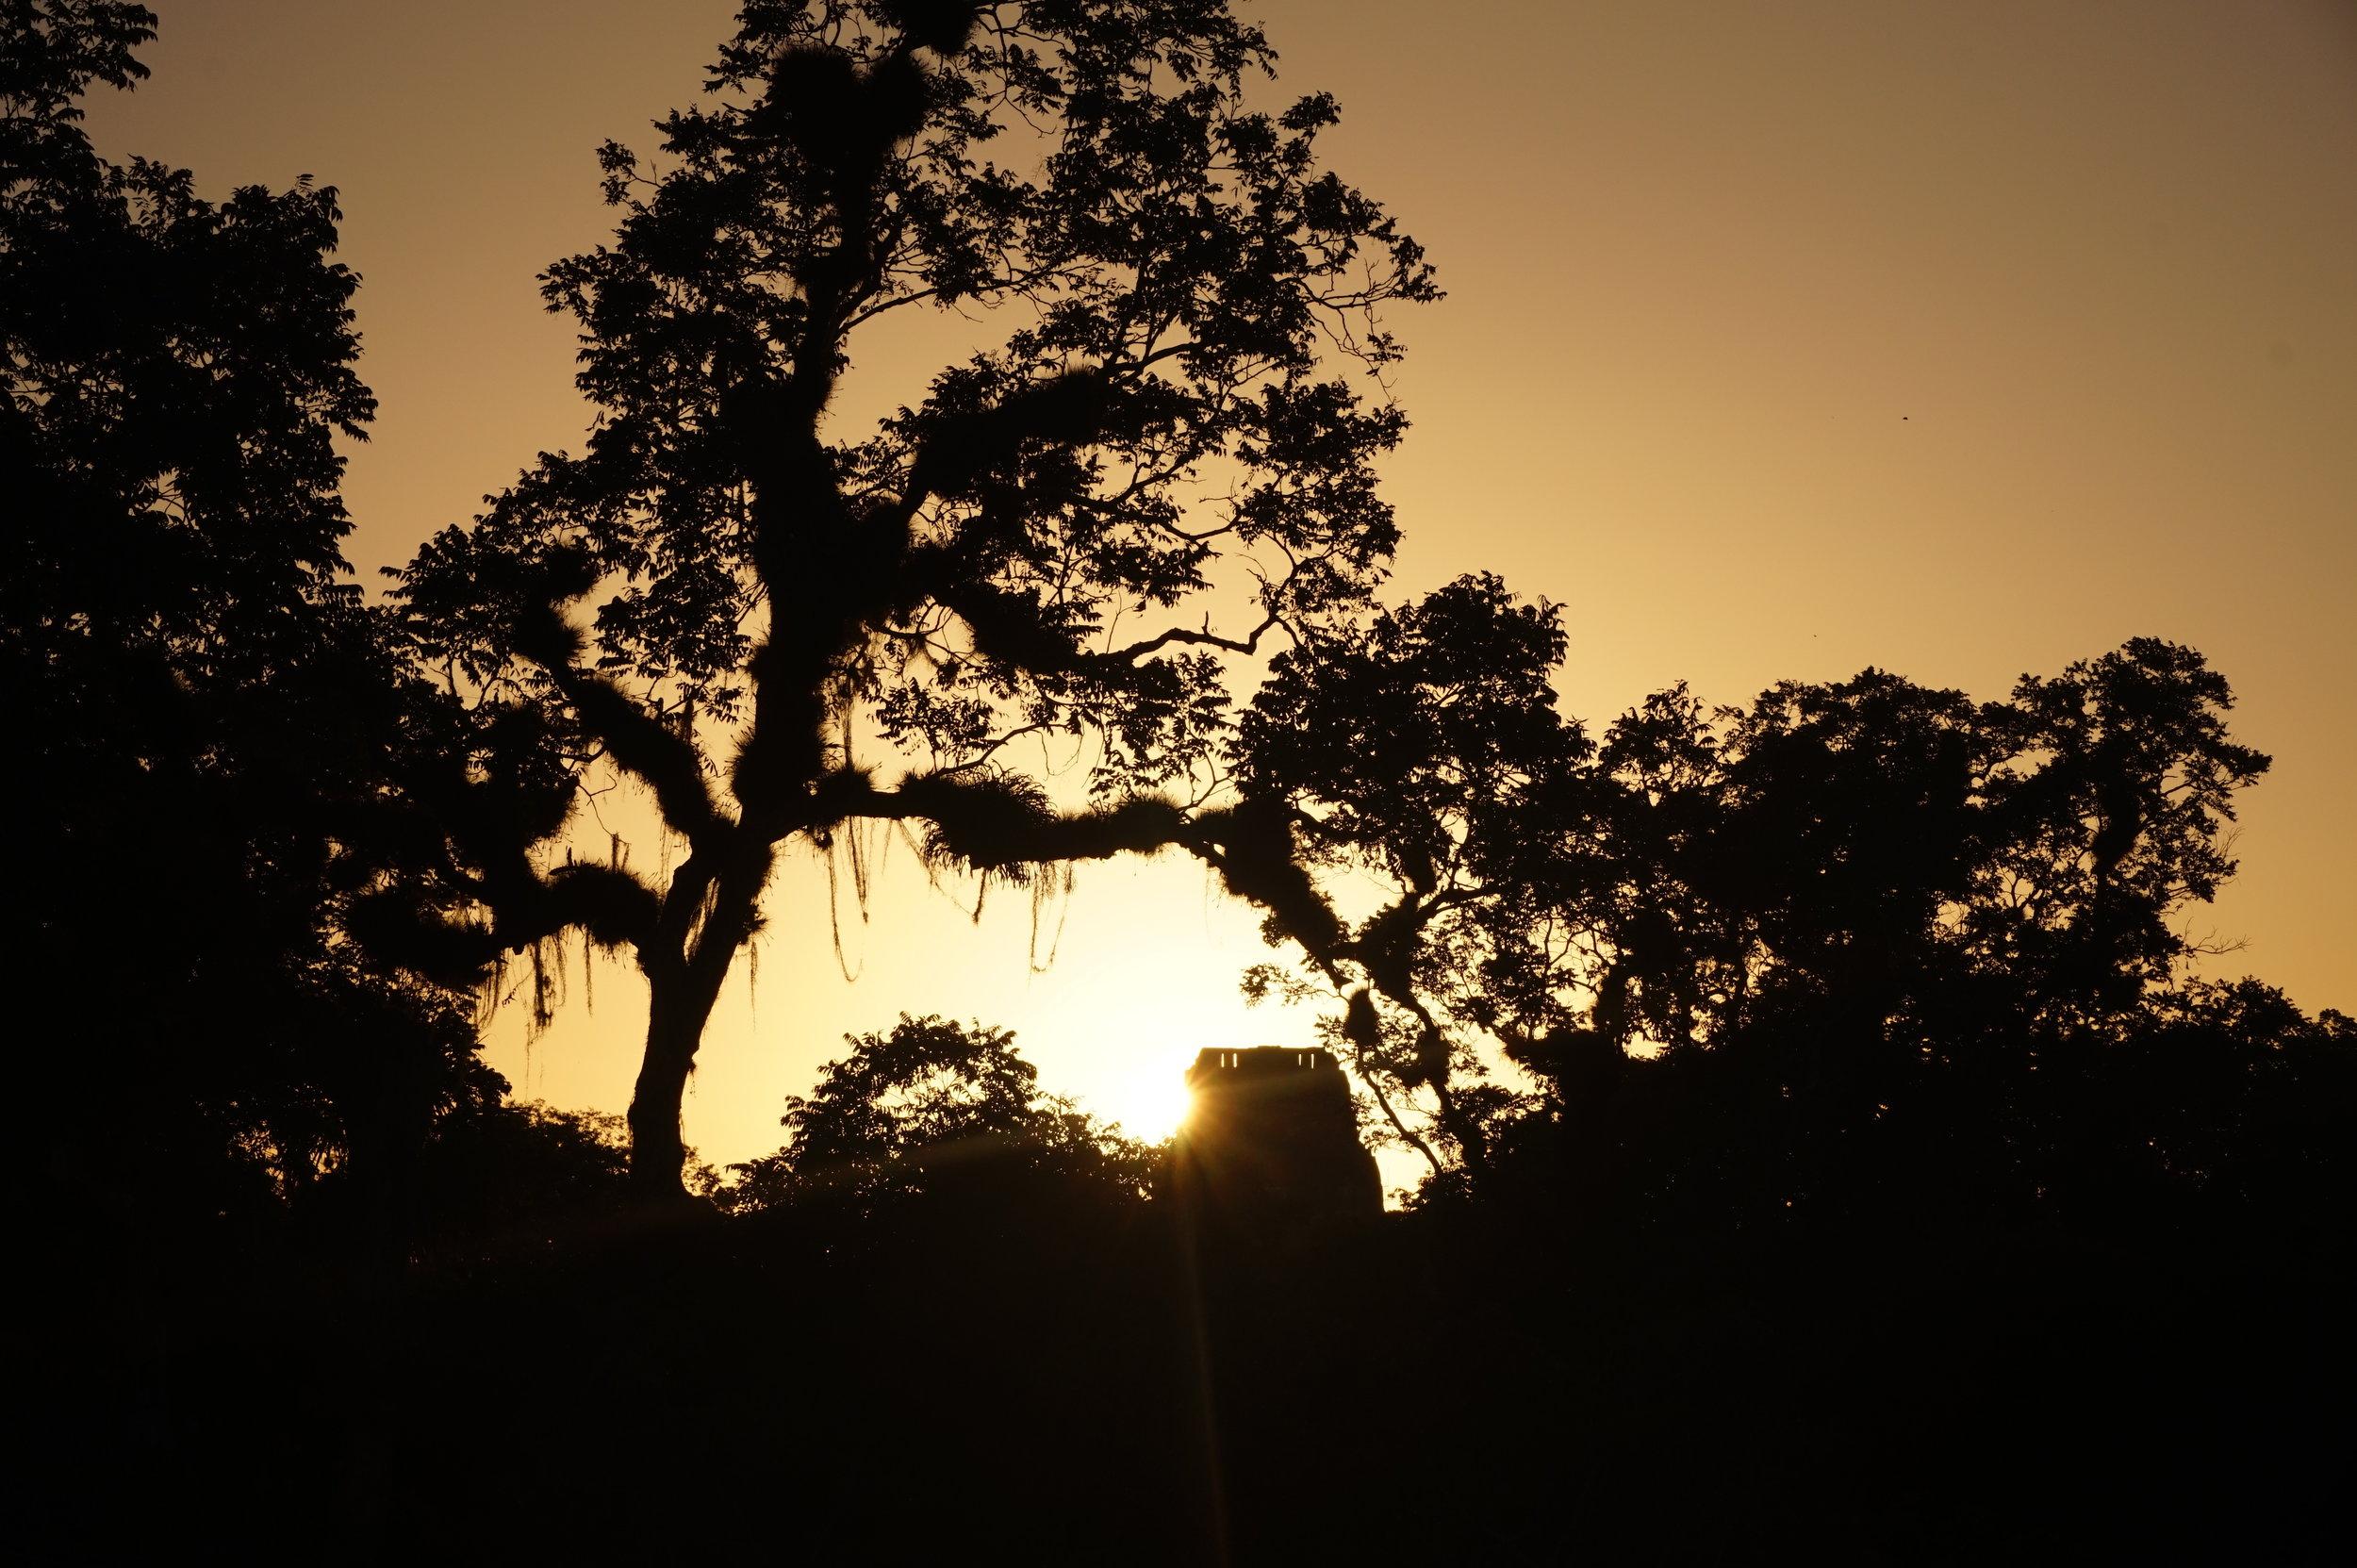 Camping at the tikal ruins and watching the sunset